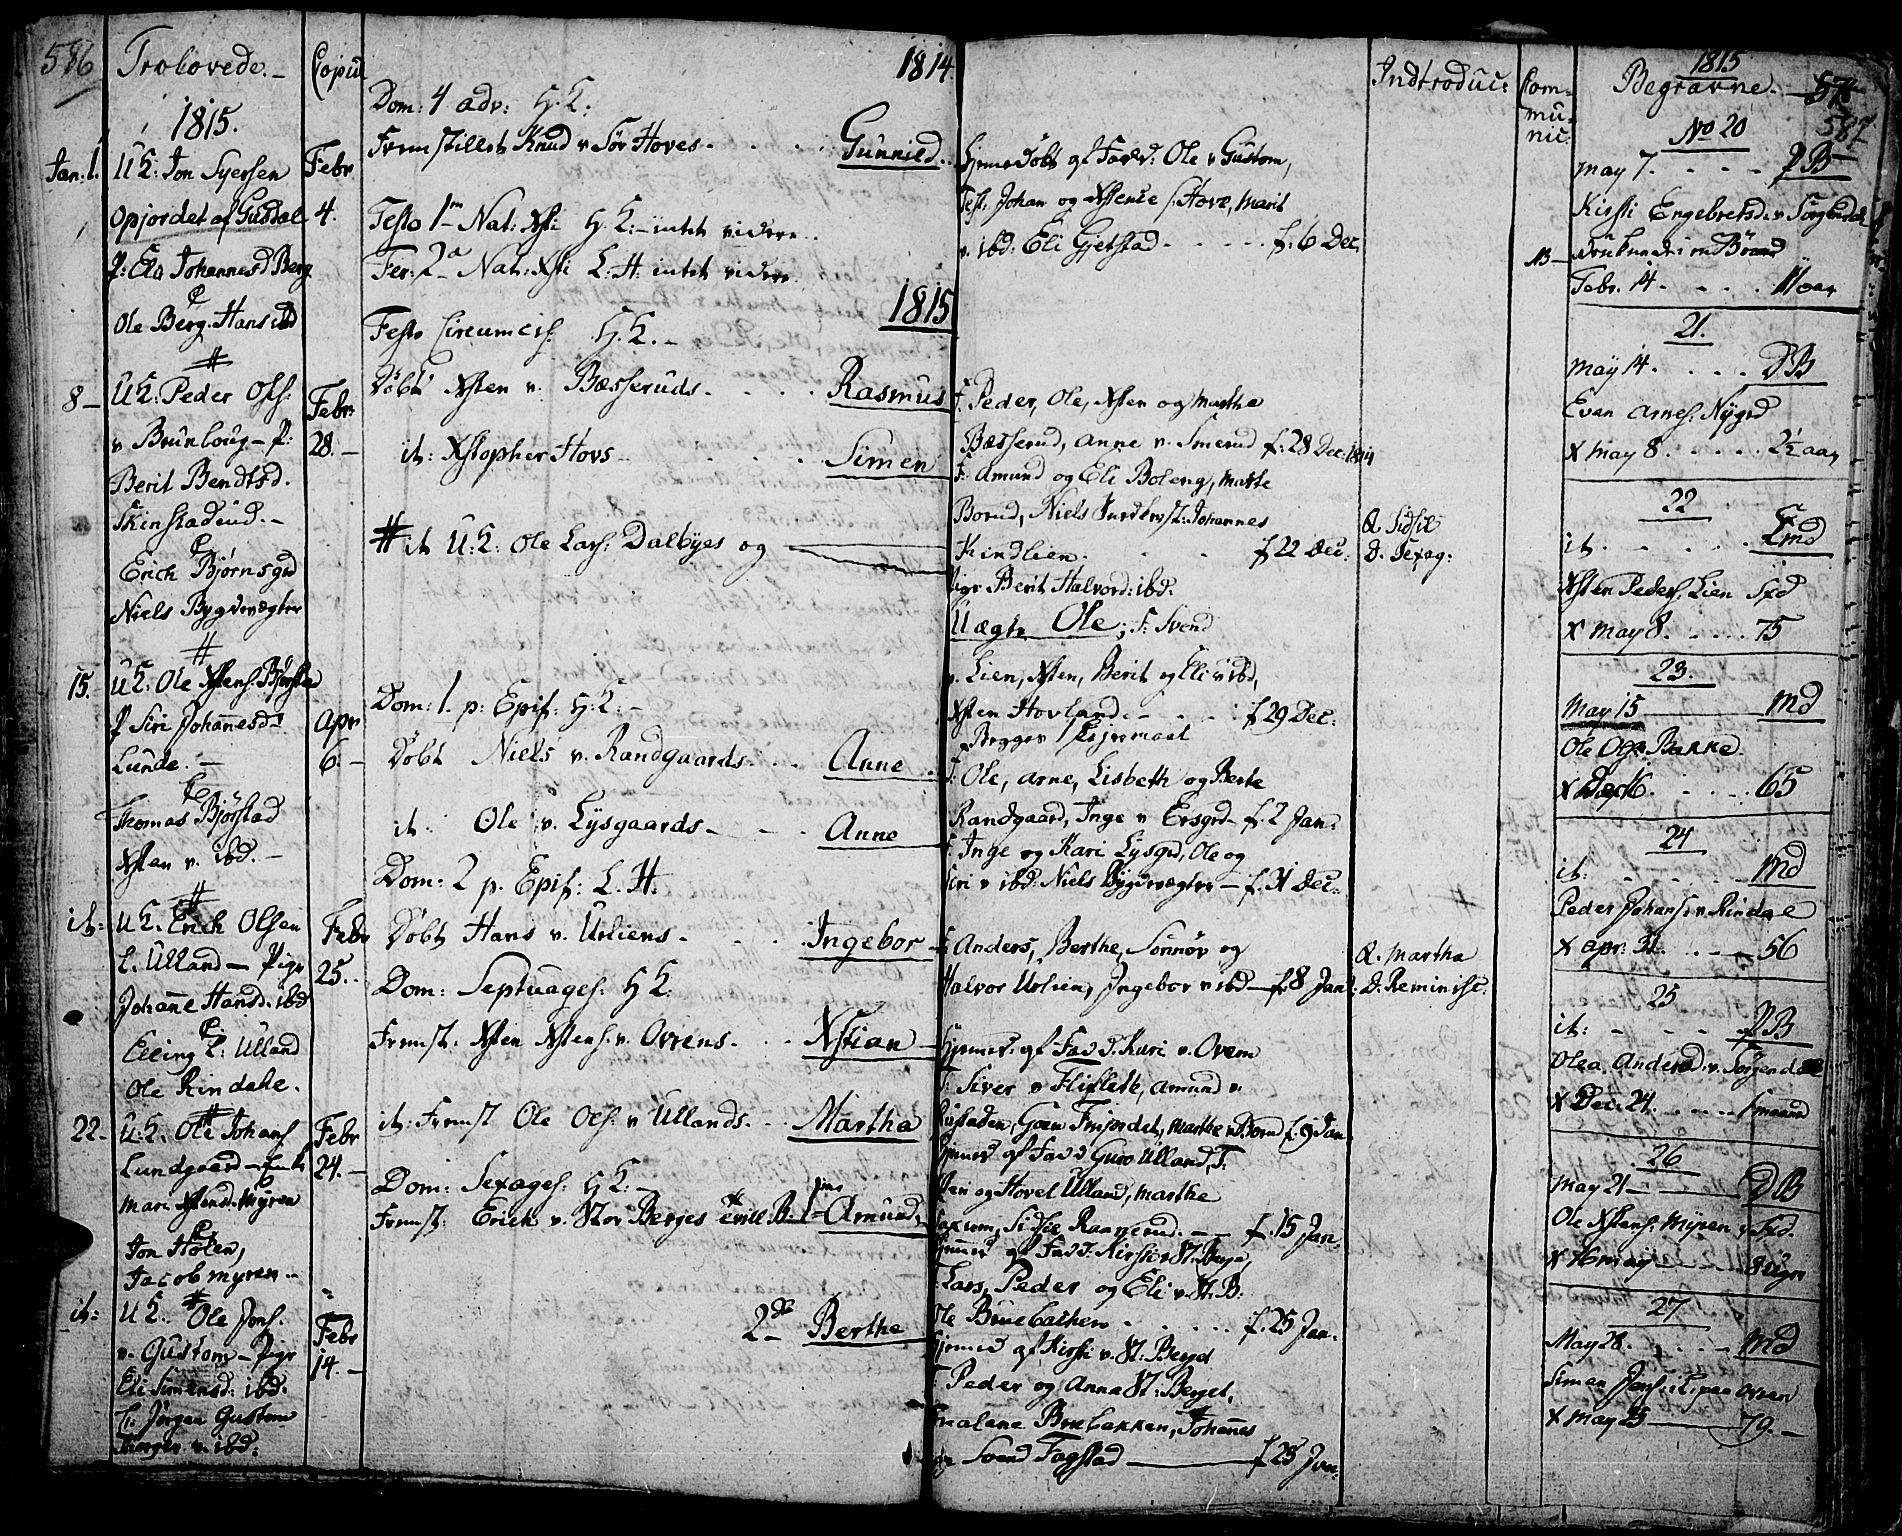 SAH, Fåberg prestekontor, Ministerialbok nr. 2, 1775-1818, s. 586-587